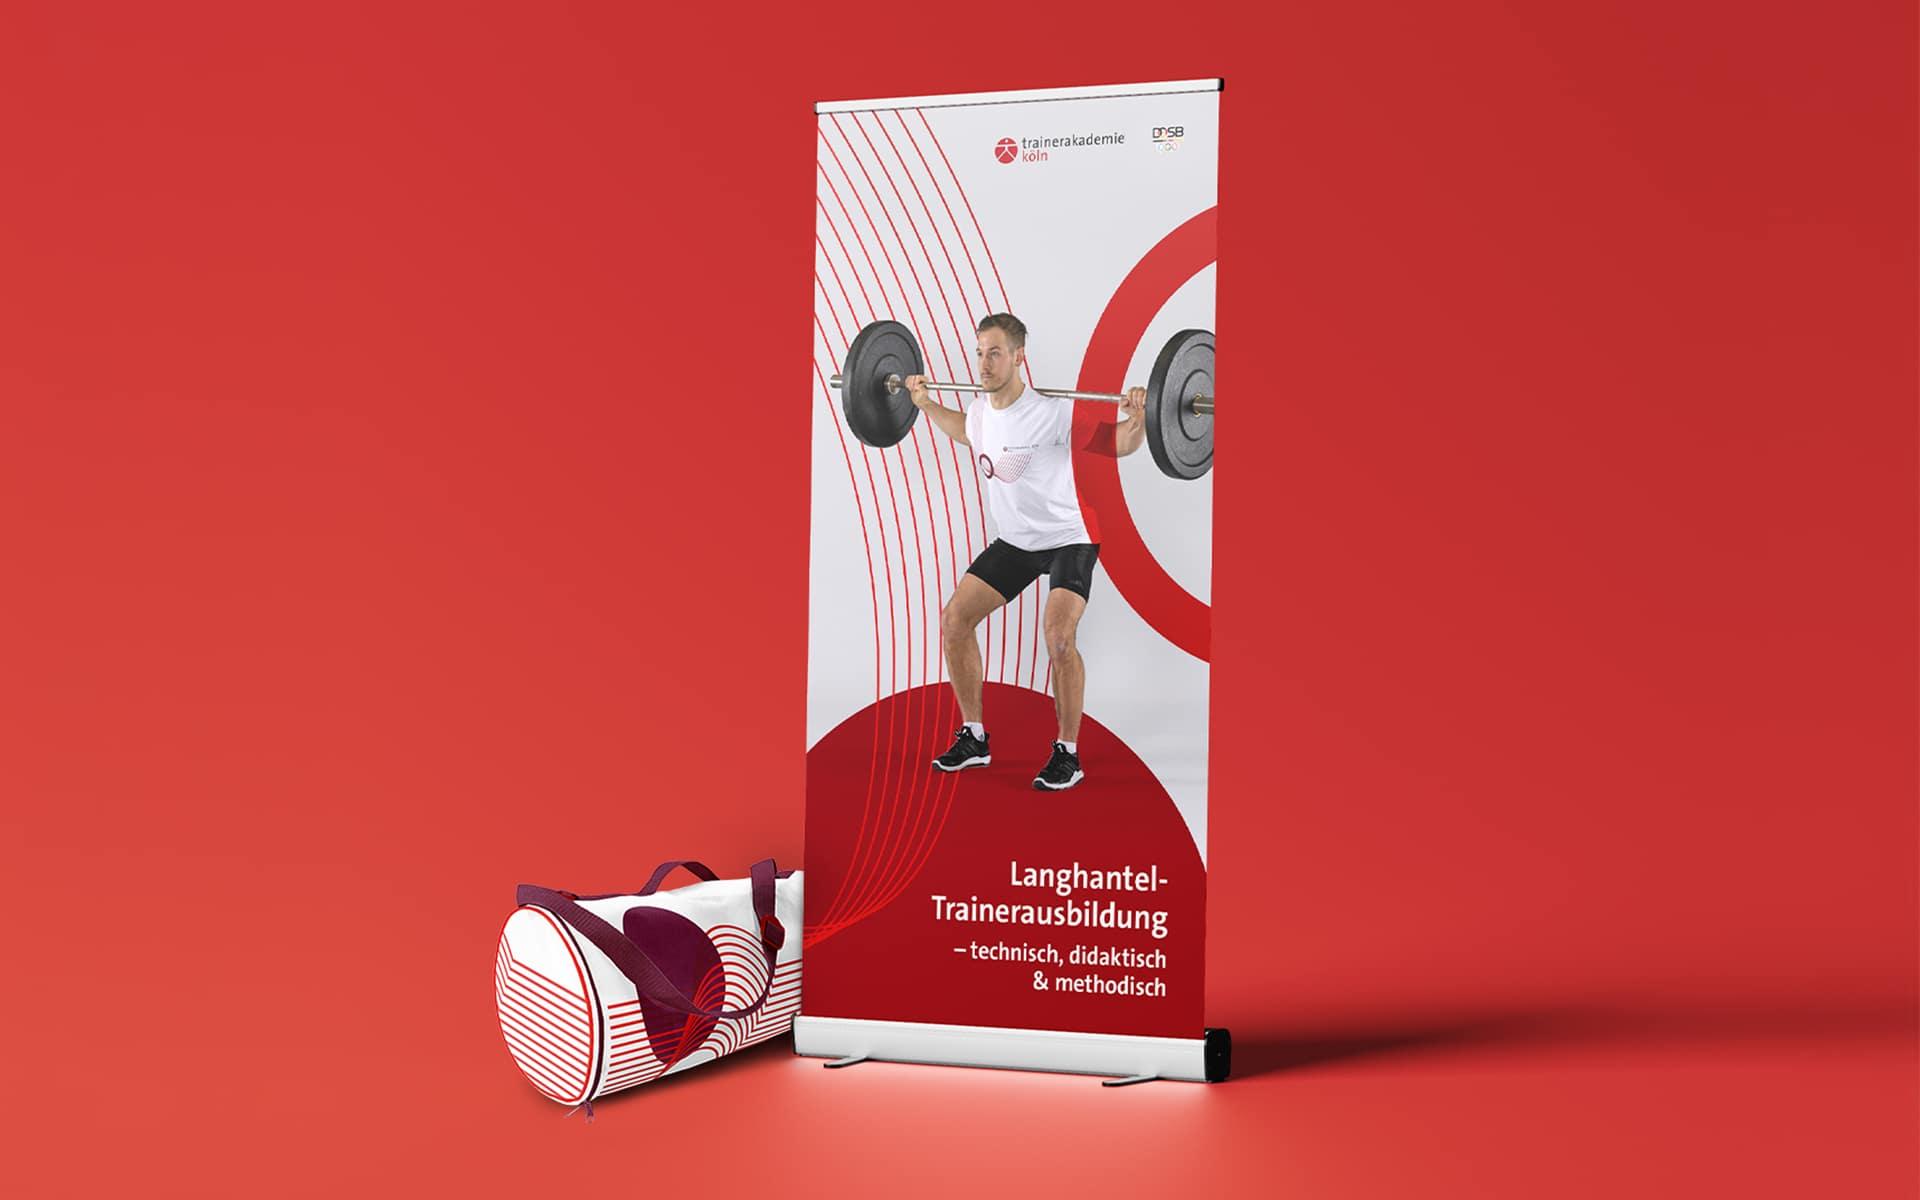 Trainerakademie Köln Corporate Design, Roll-Up-Banners